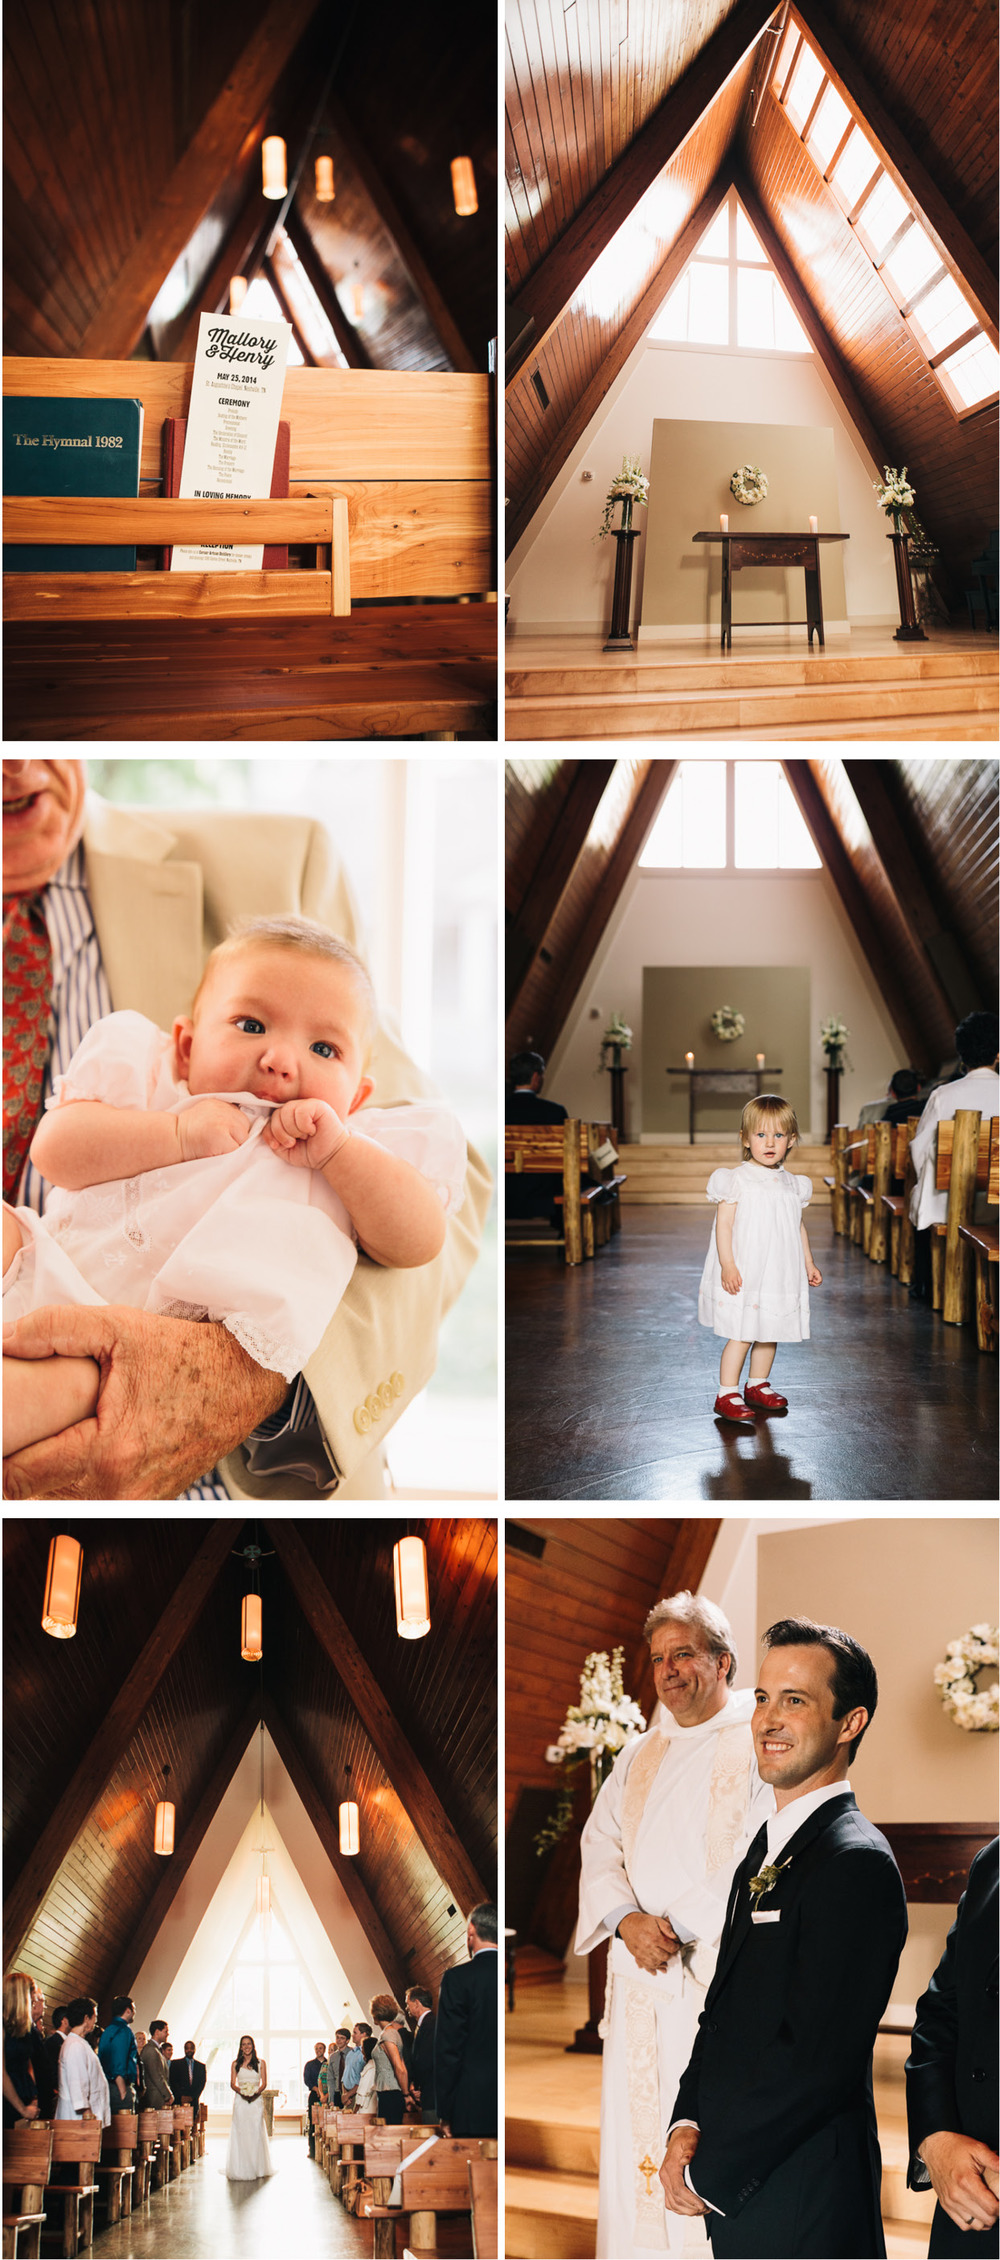 CK-Photo-Nashville-Wedding-Photographer-mh4.jpg